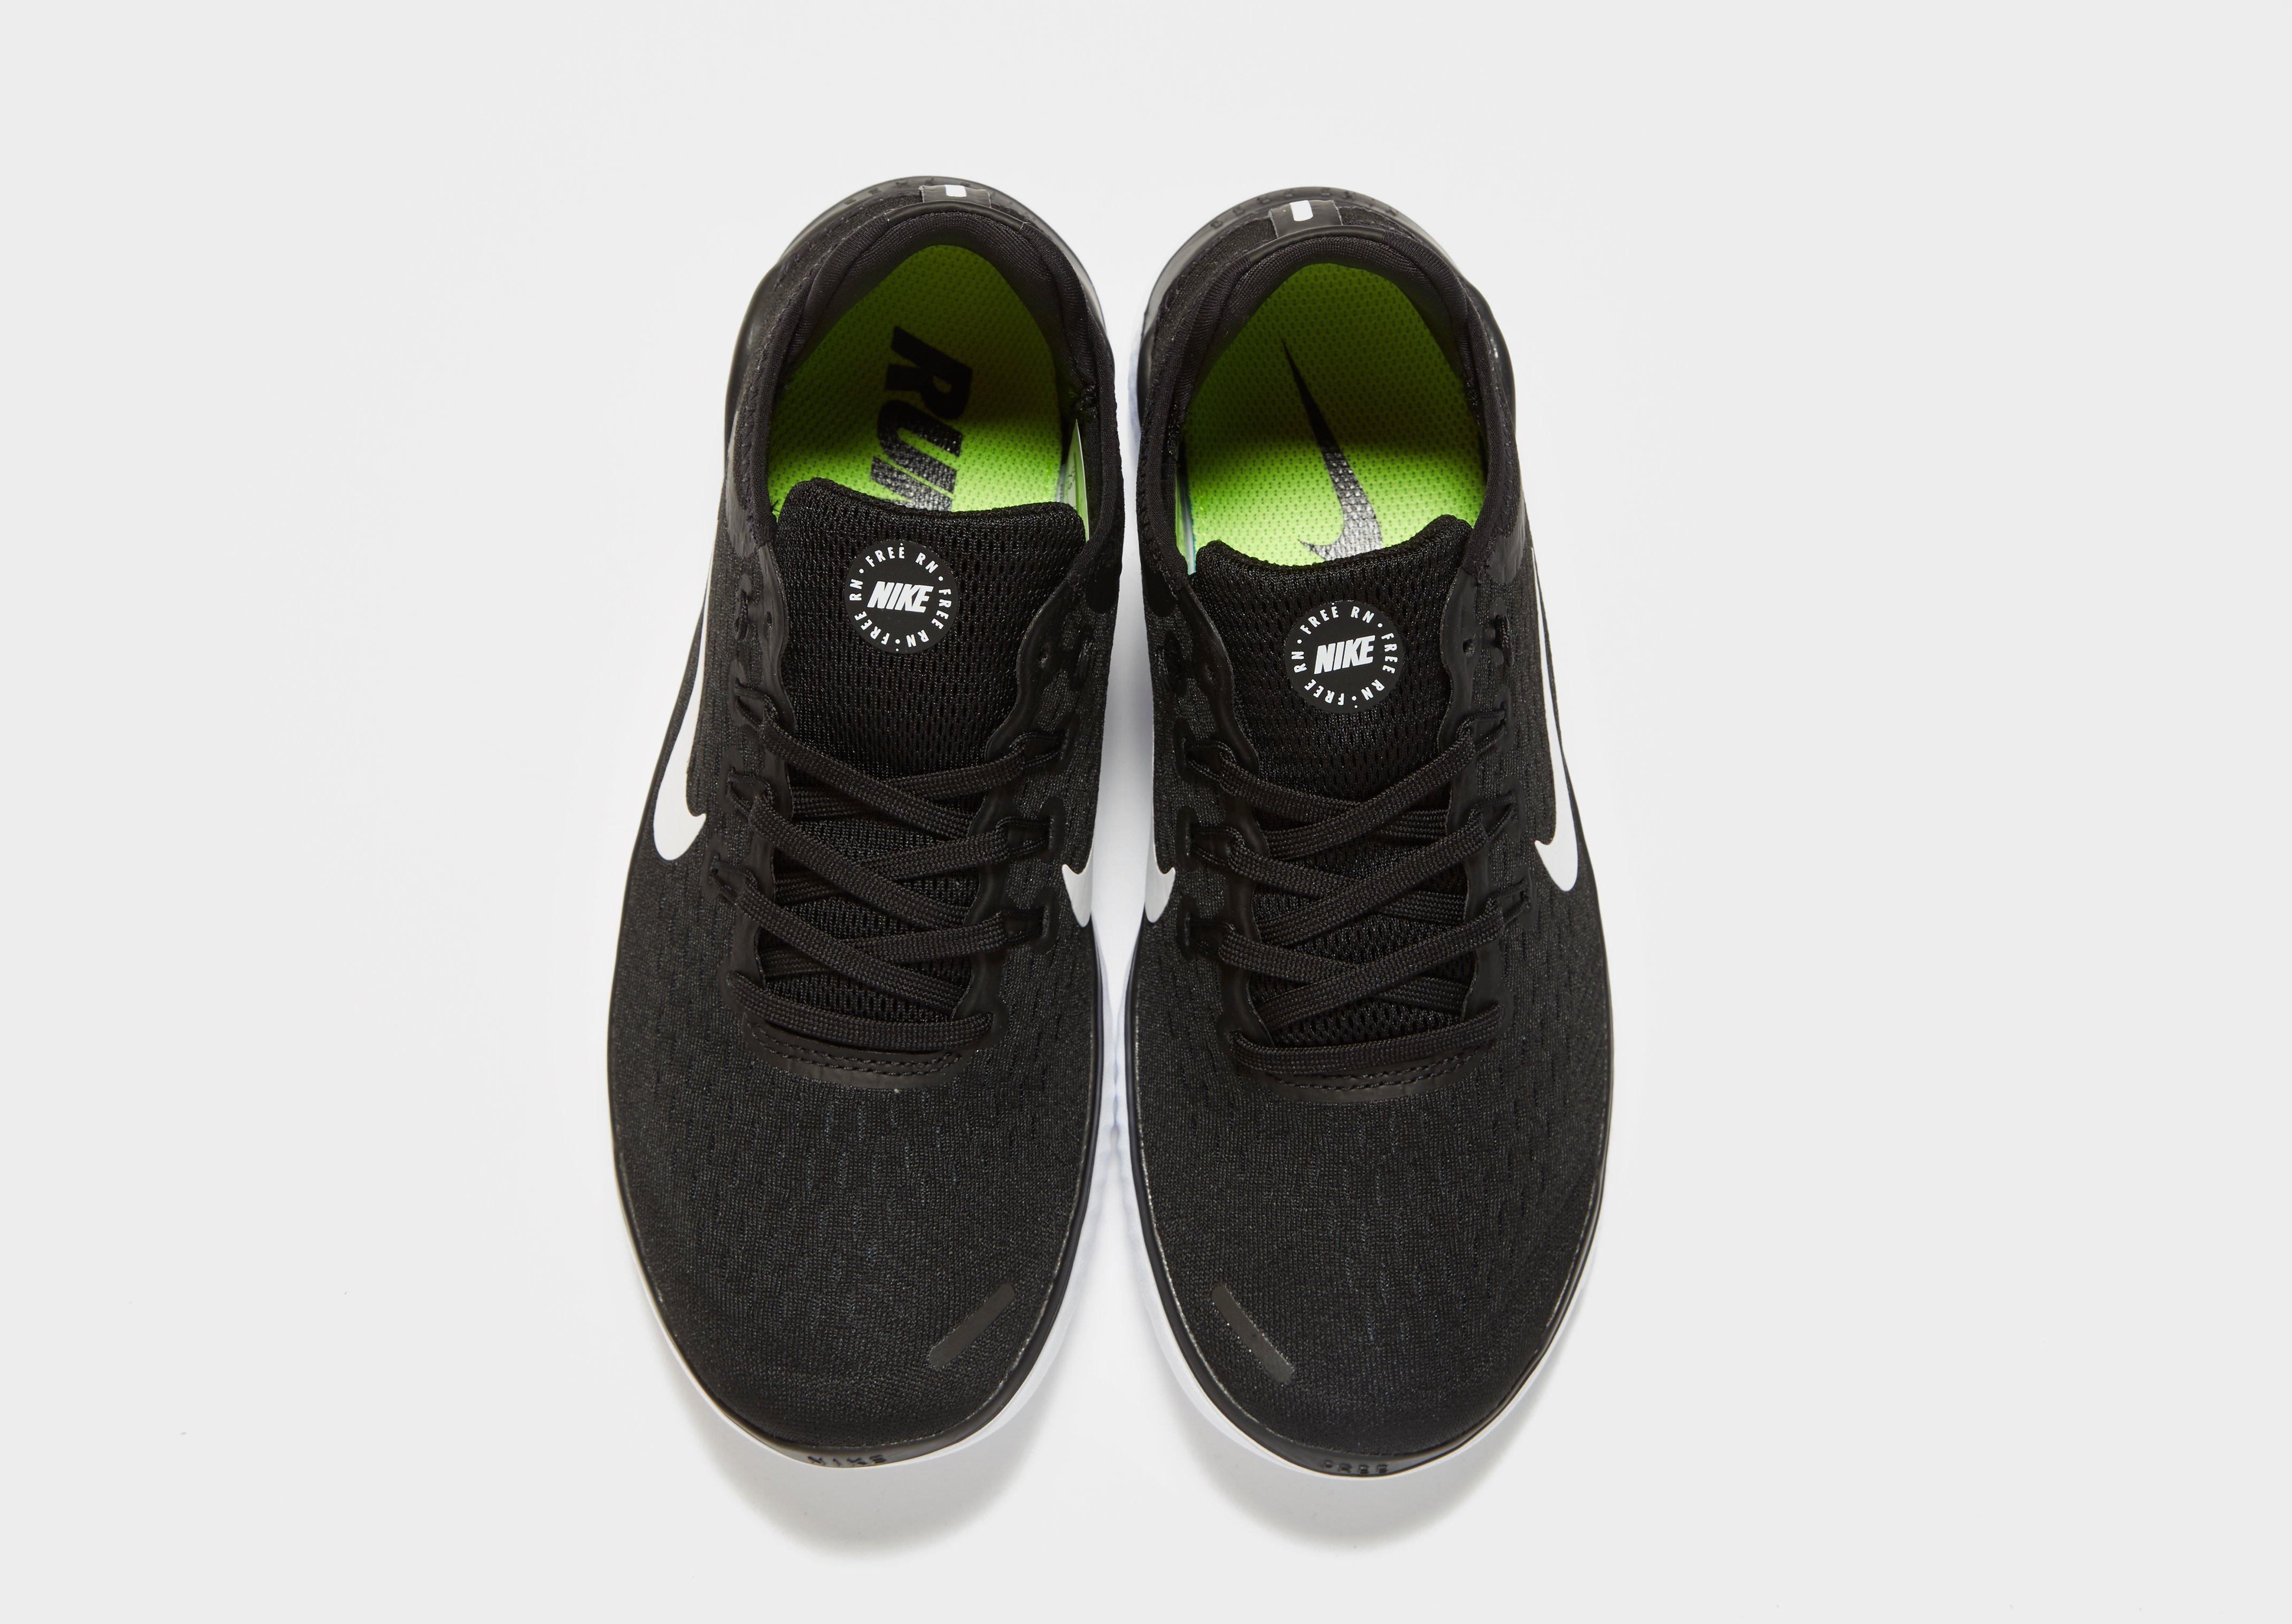 new arrival ef459 e2e26 nike dual fusion basketball shoes